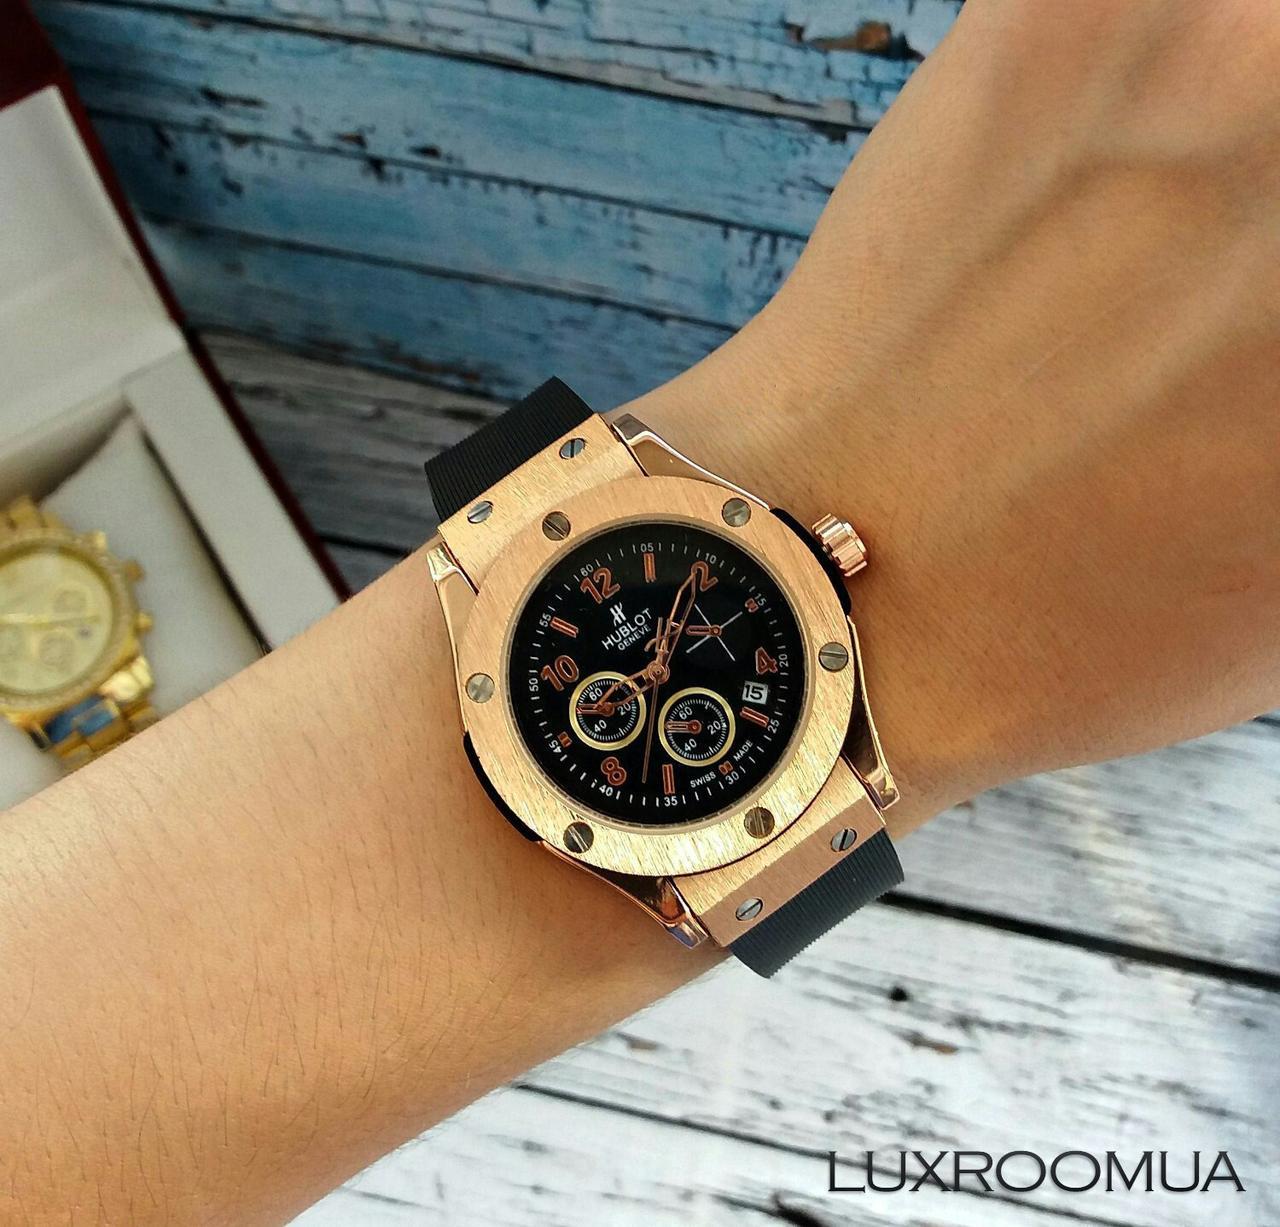 JW226 часы Для женщин BAOSAILI бренд моды роскошь кварц